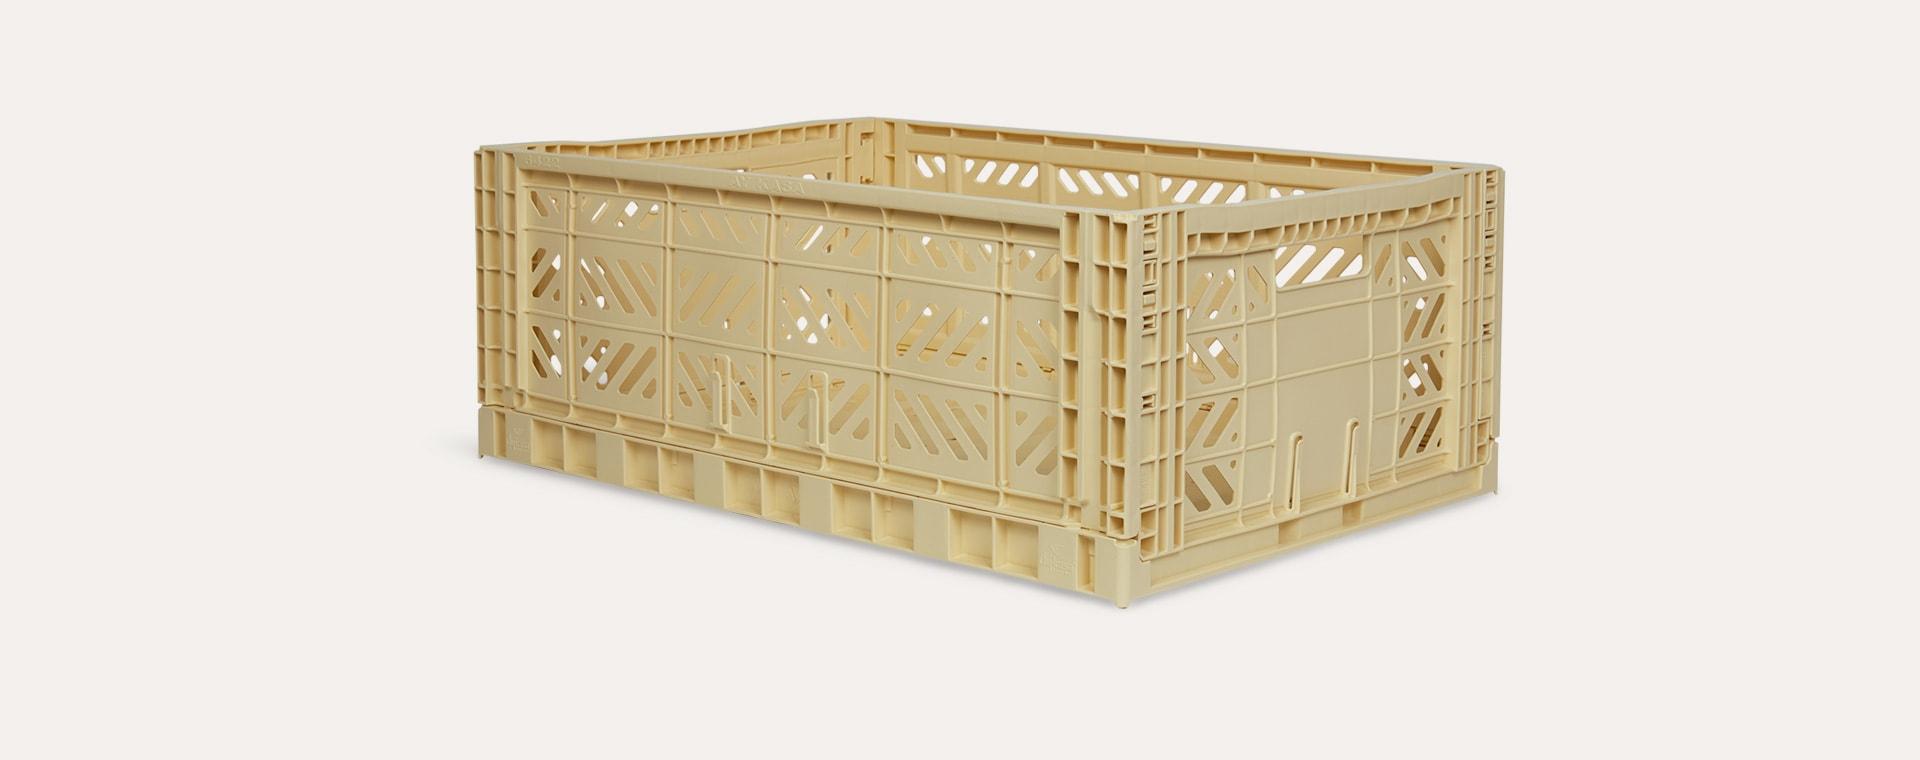 Banana Aykasa Maxi Crate